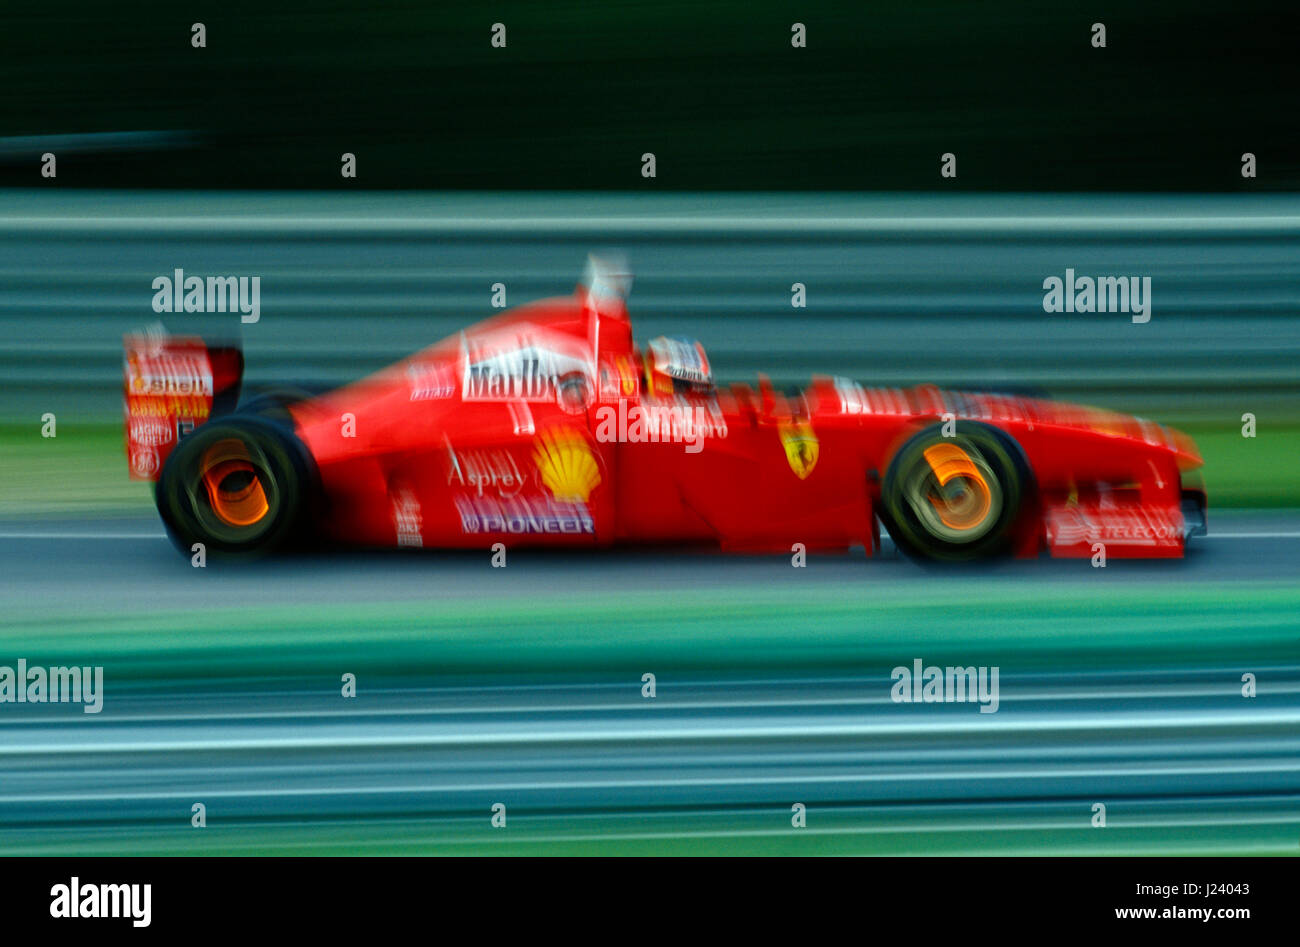 F1, Ferrari, Michael Schumacher, Austria GP 1997   Stock Image